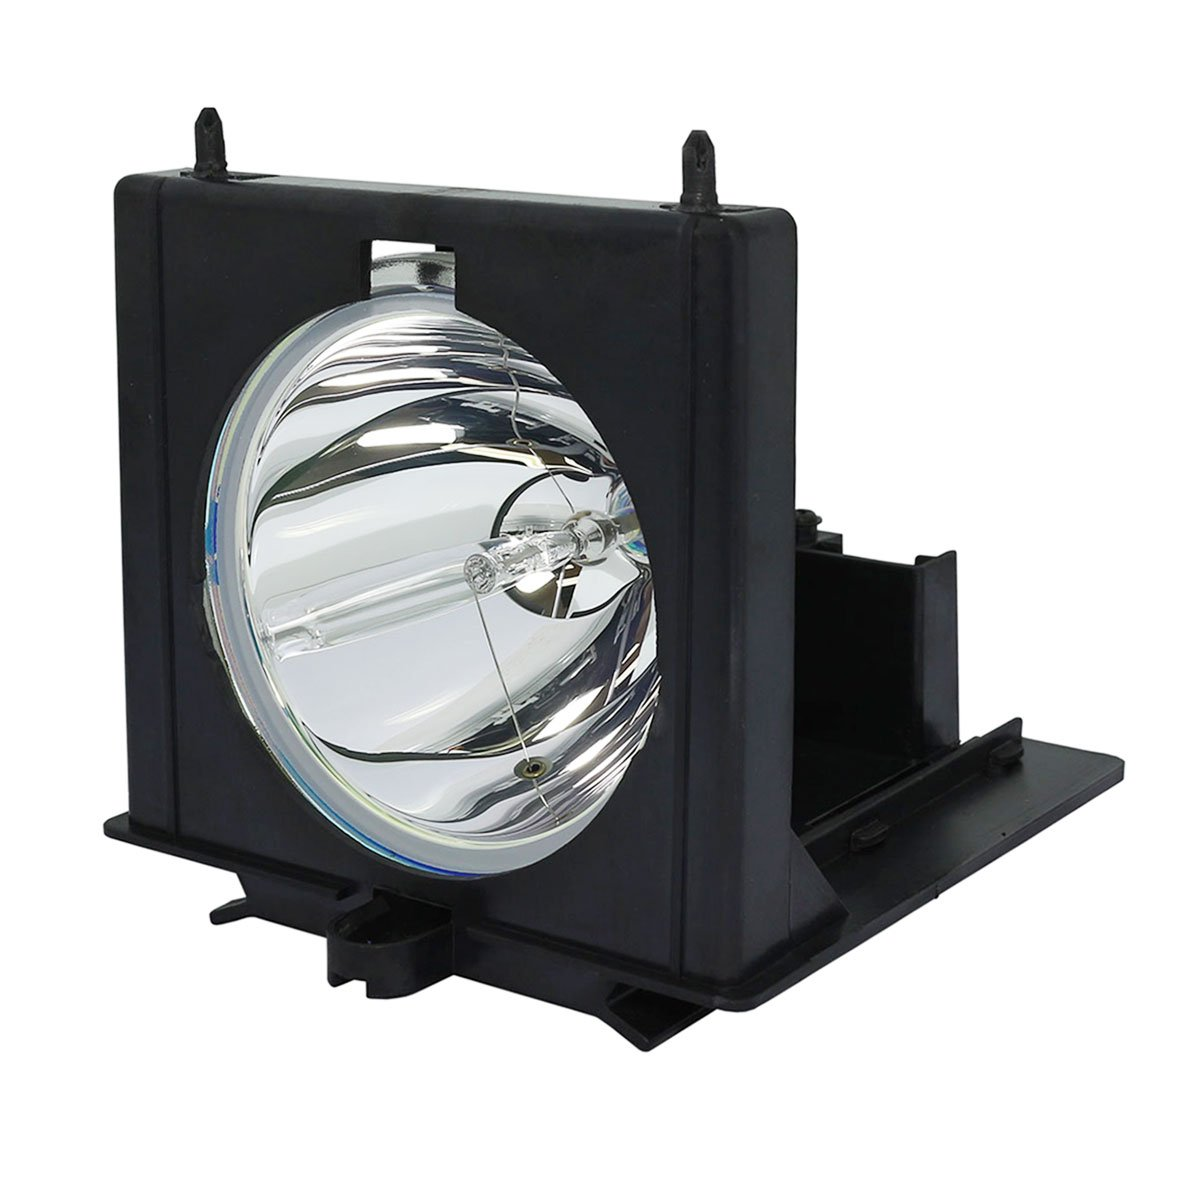 SpArc テレビ交換用ランプ 囲い/電球付き RCA HD50LPW163YX2(H) Platinum (Brighter/Durable) B07MPSS5LY Lamp with Housing Platinum (Brighter/Durable)